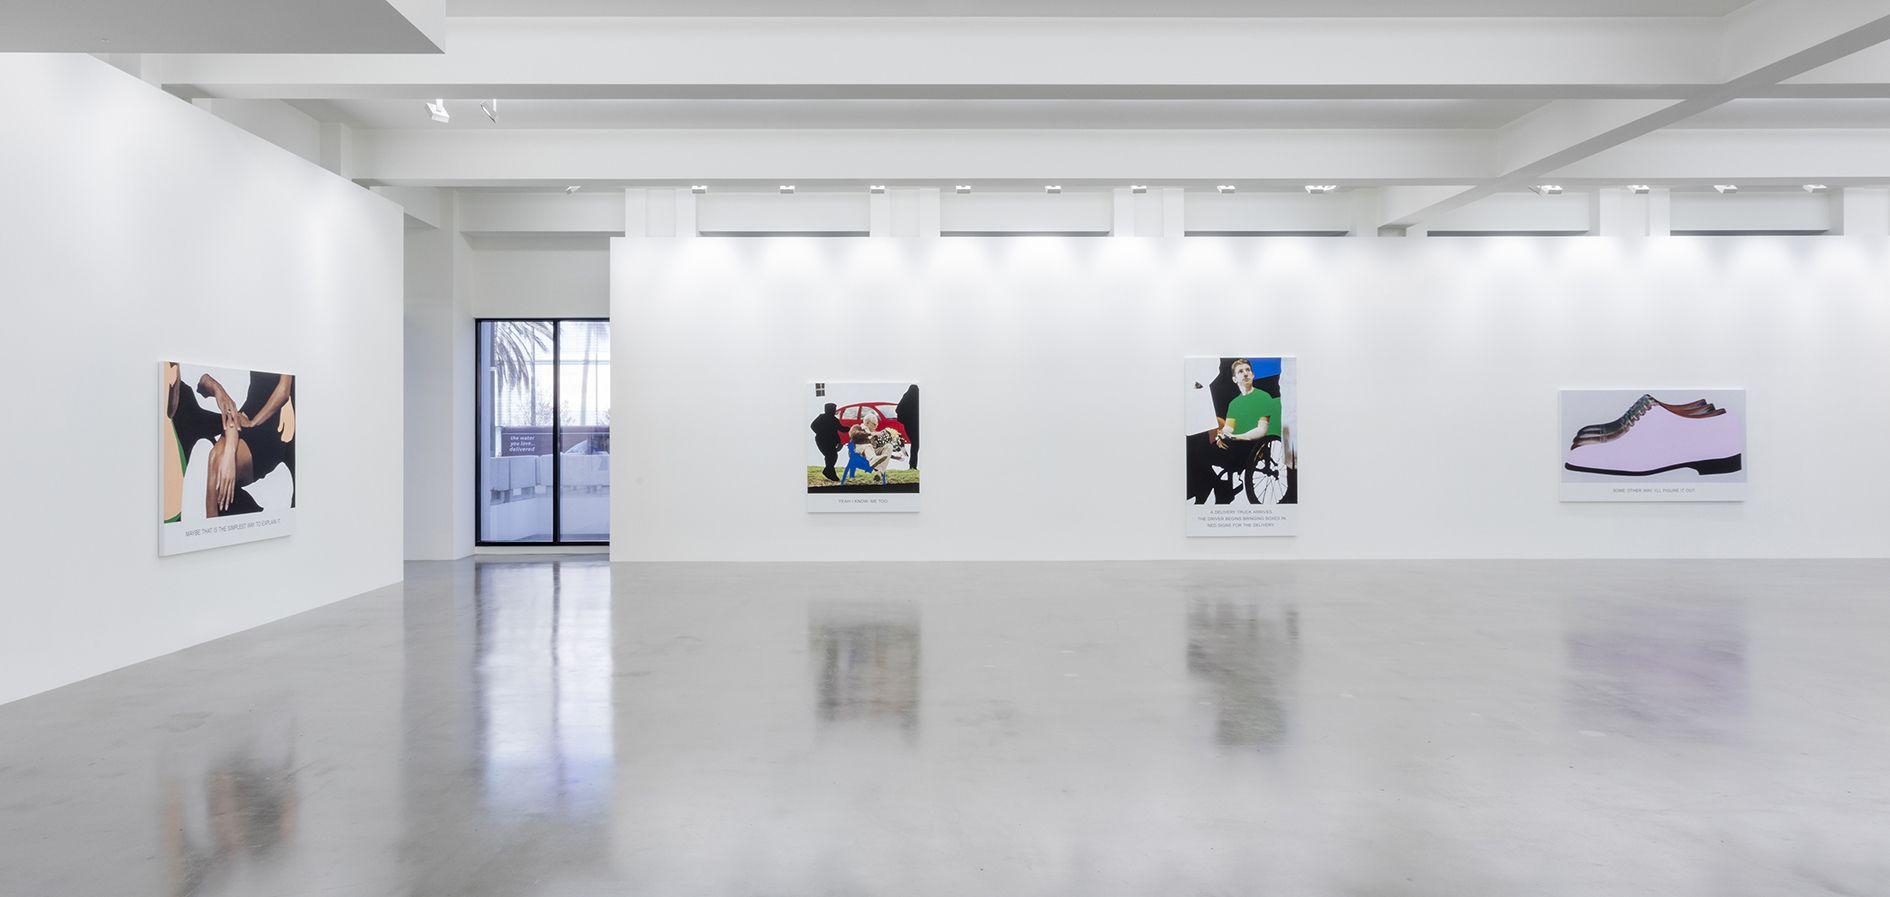 John Baldessari – John Baldessari – Los Angeles